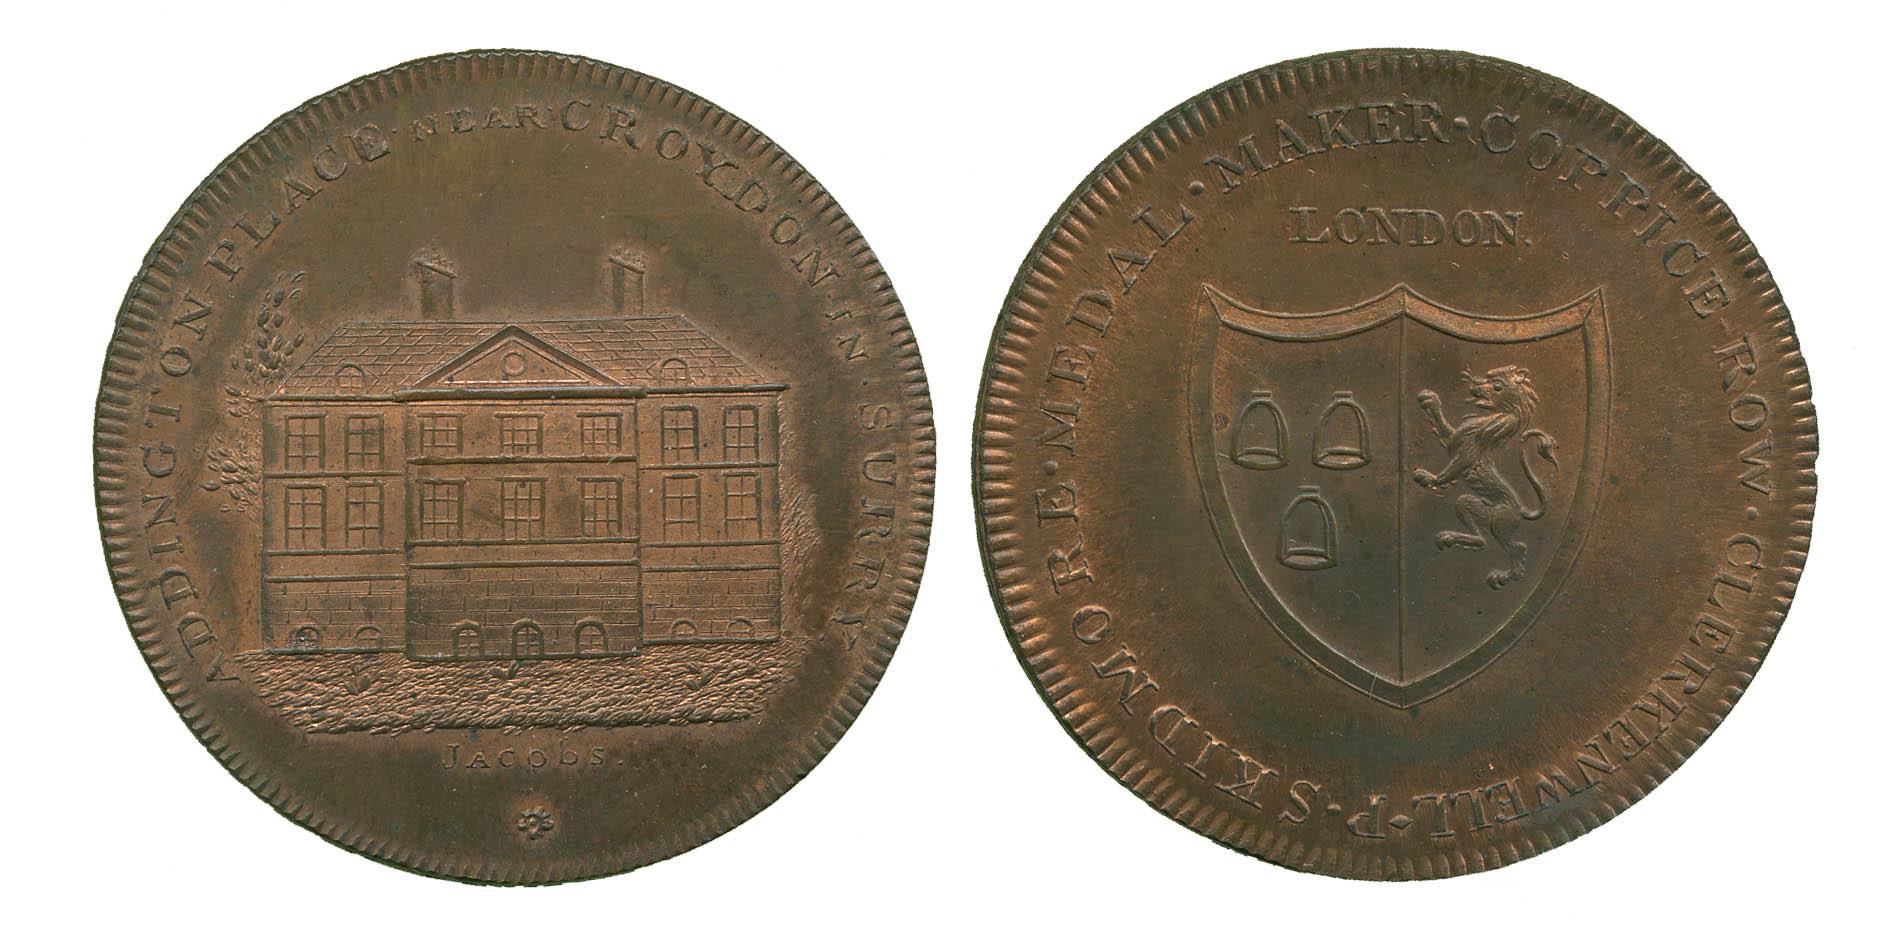 Surrey, Croydon, Addington Place, Penny Token, 1797